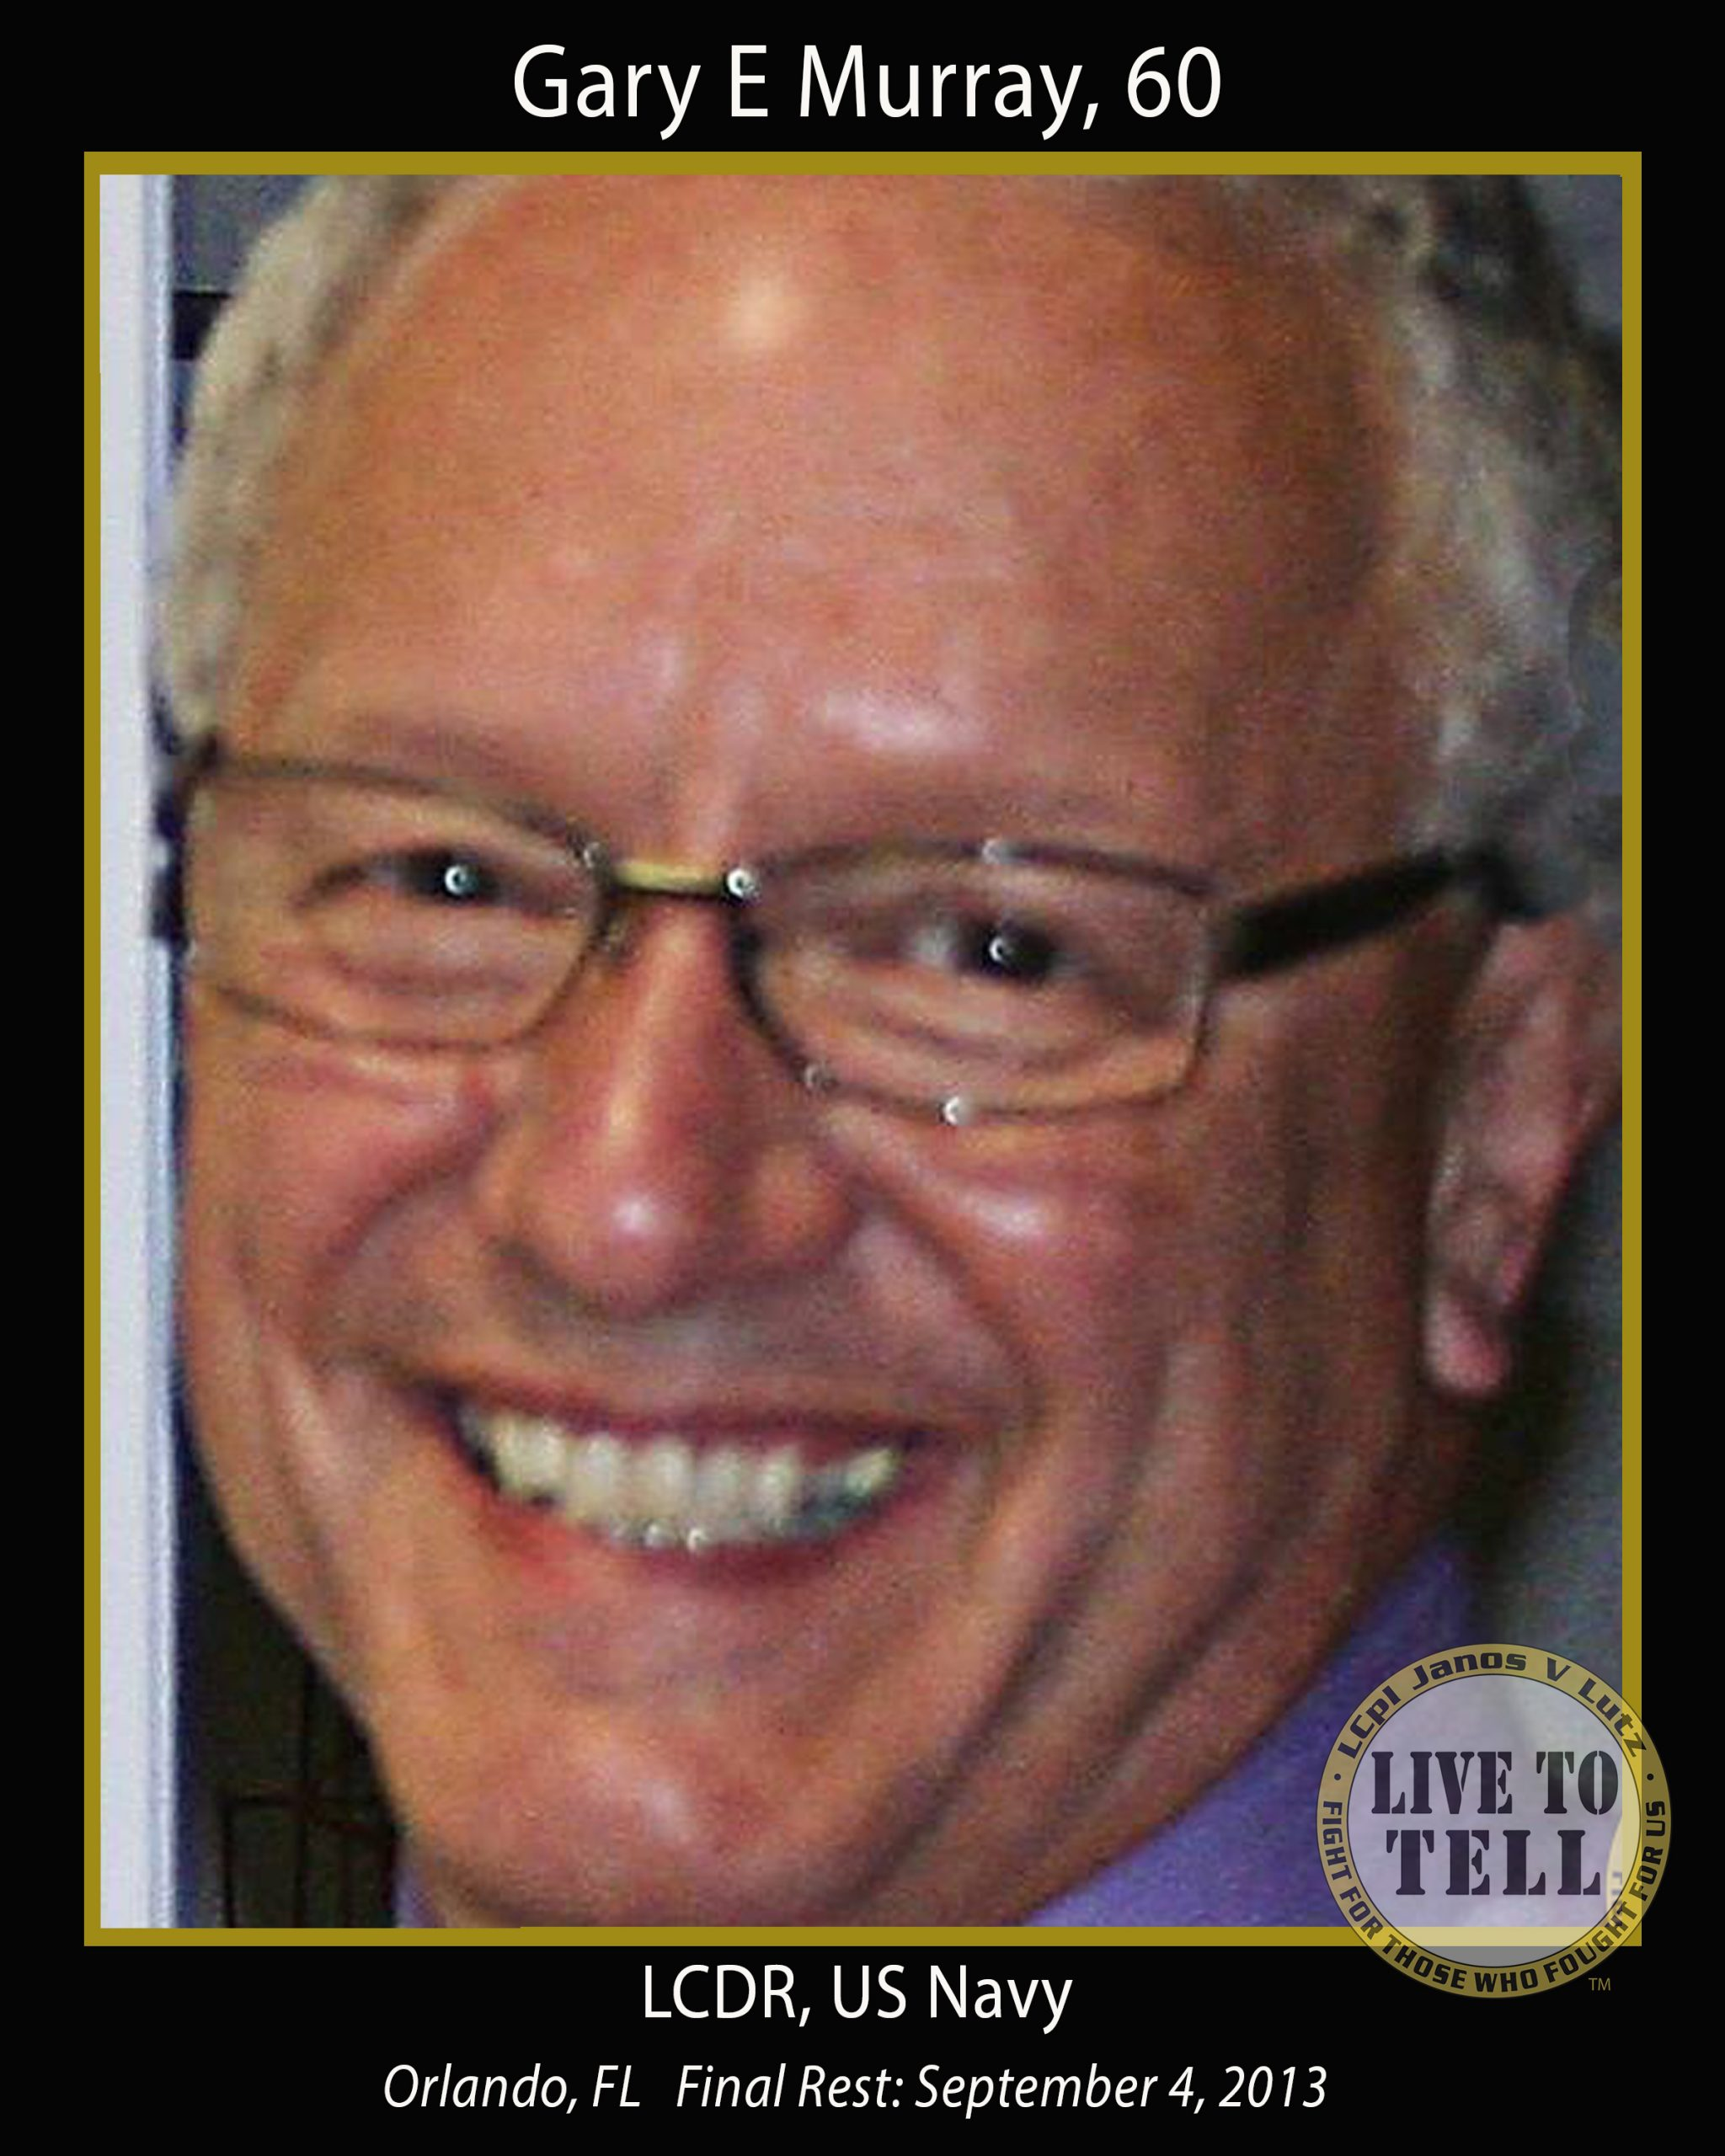 Gary E Murray, 60